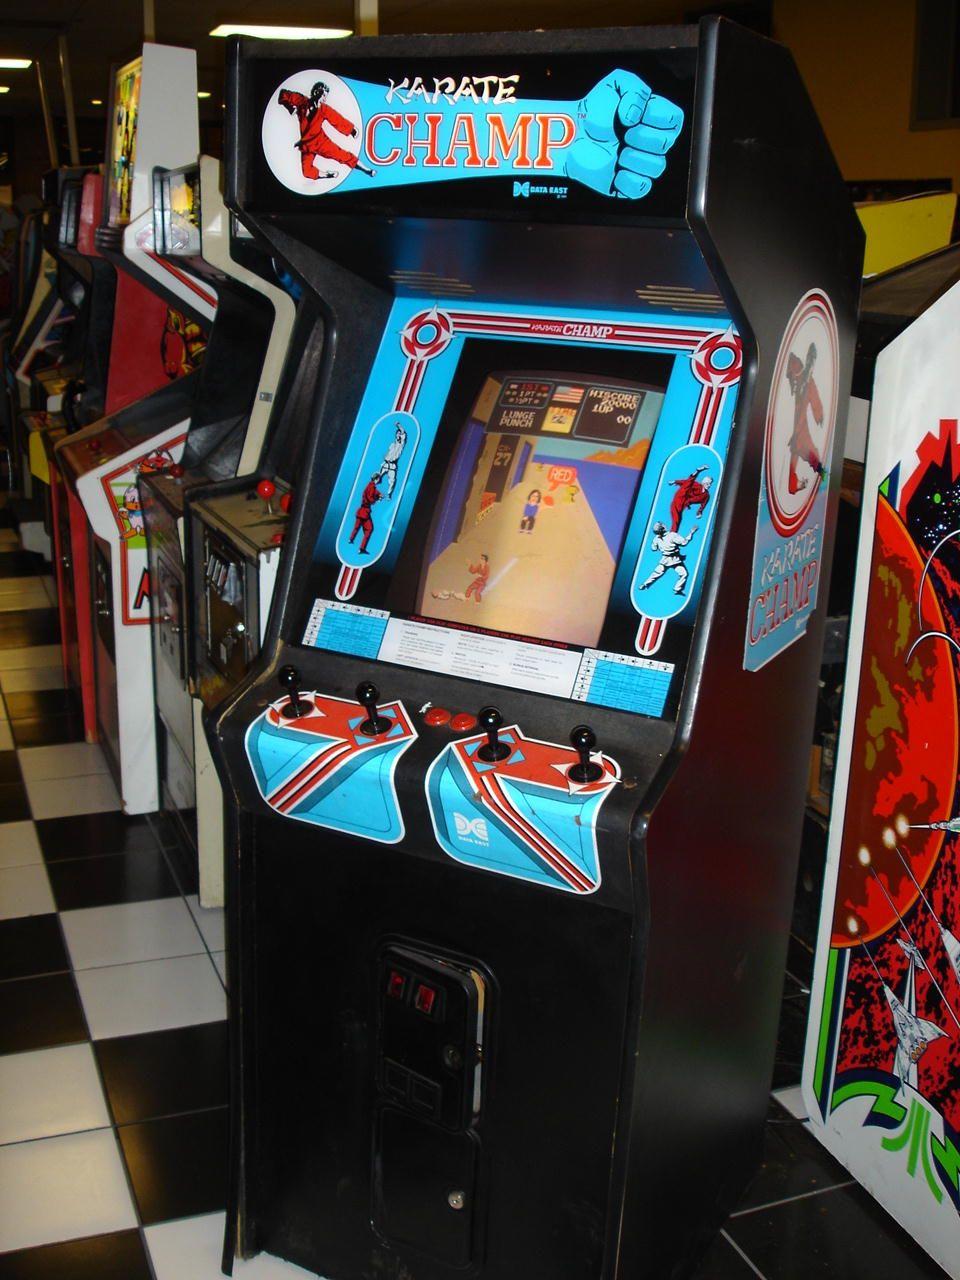 karate champ arcade cabinet